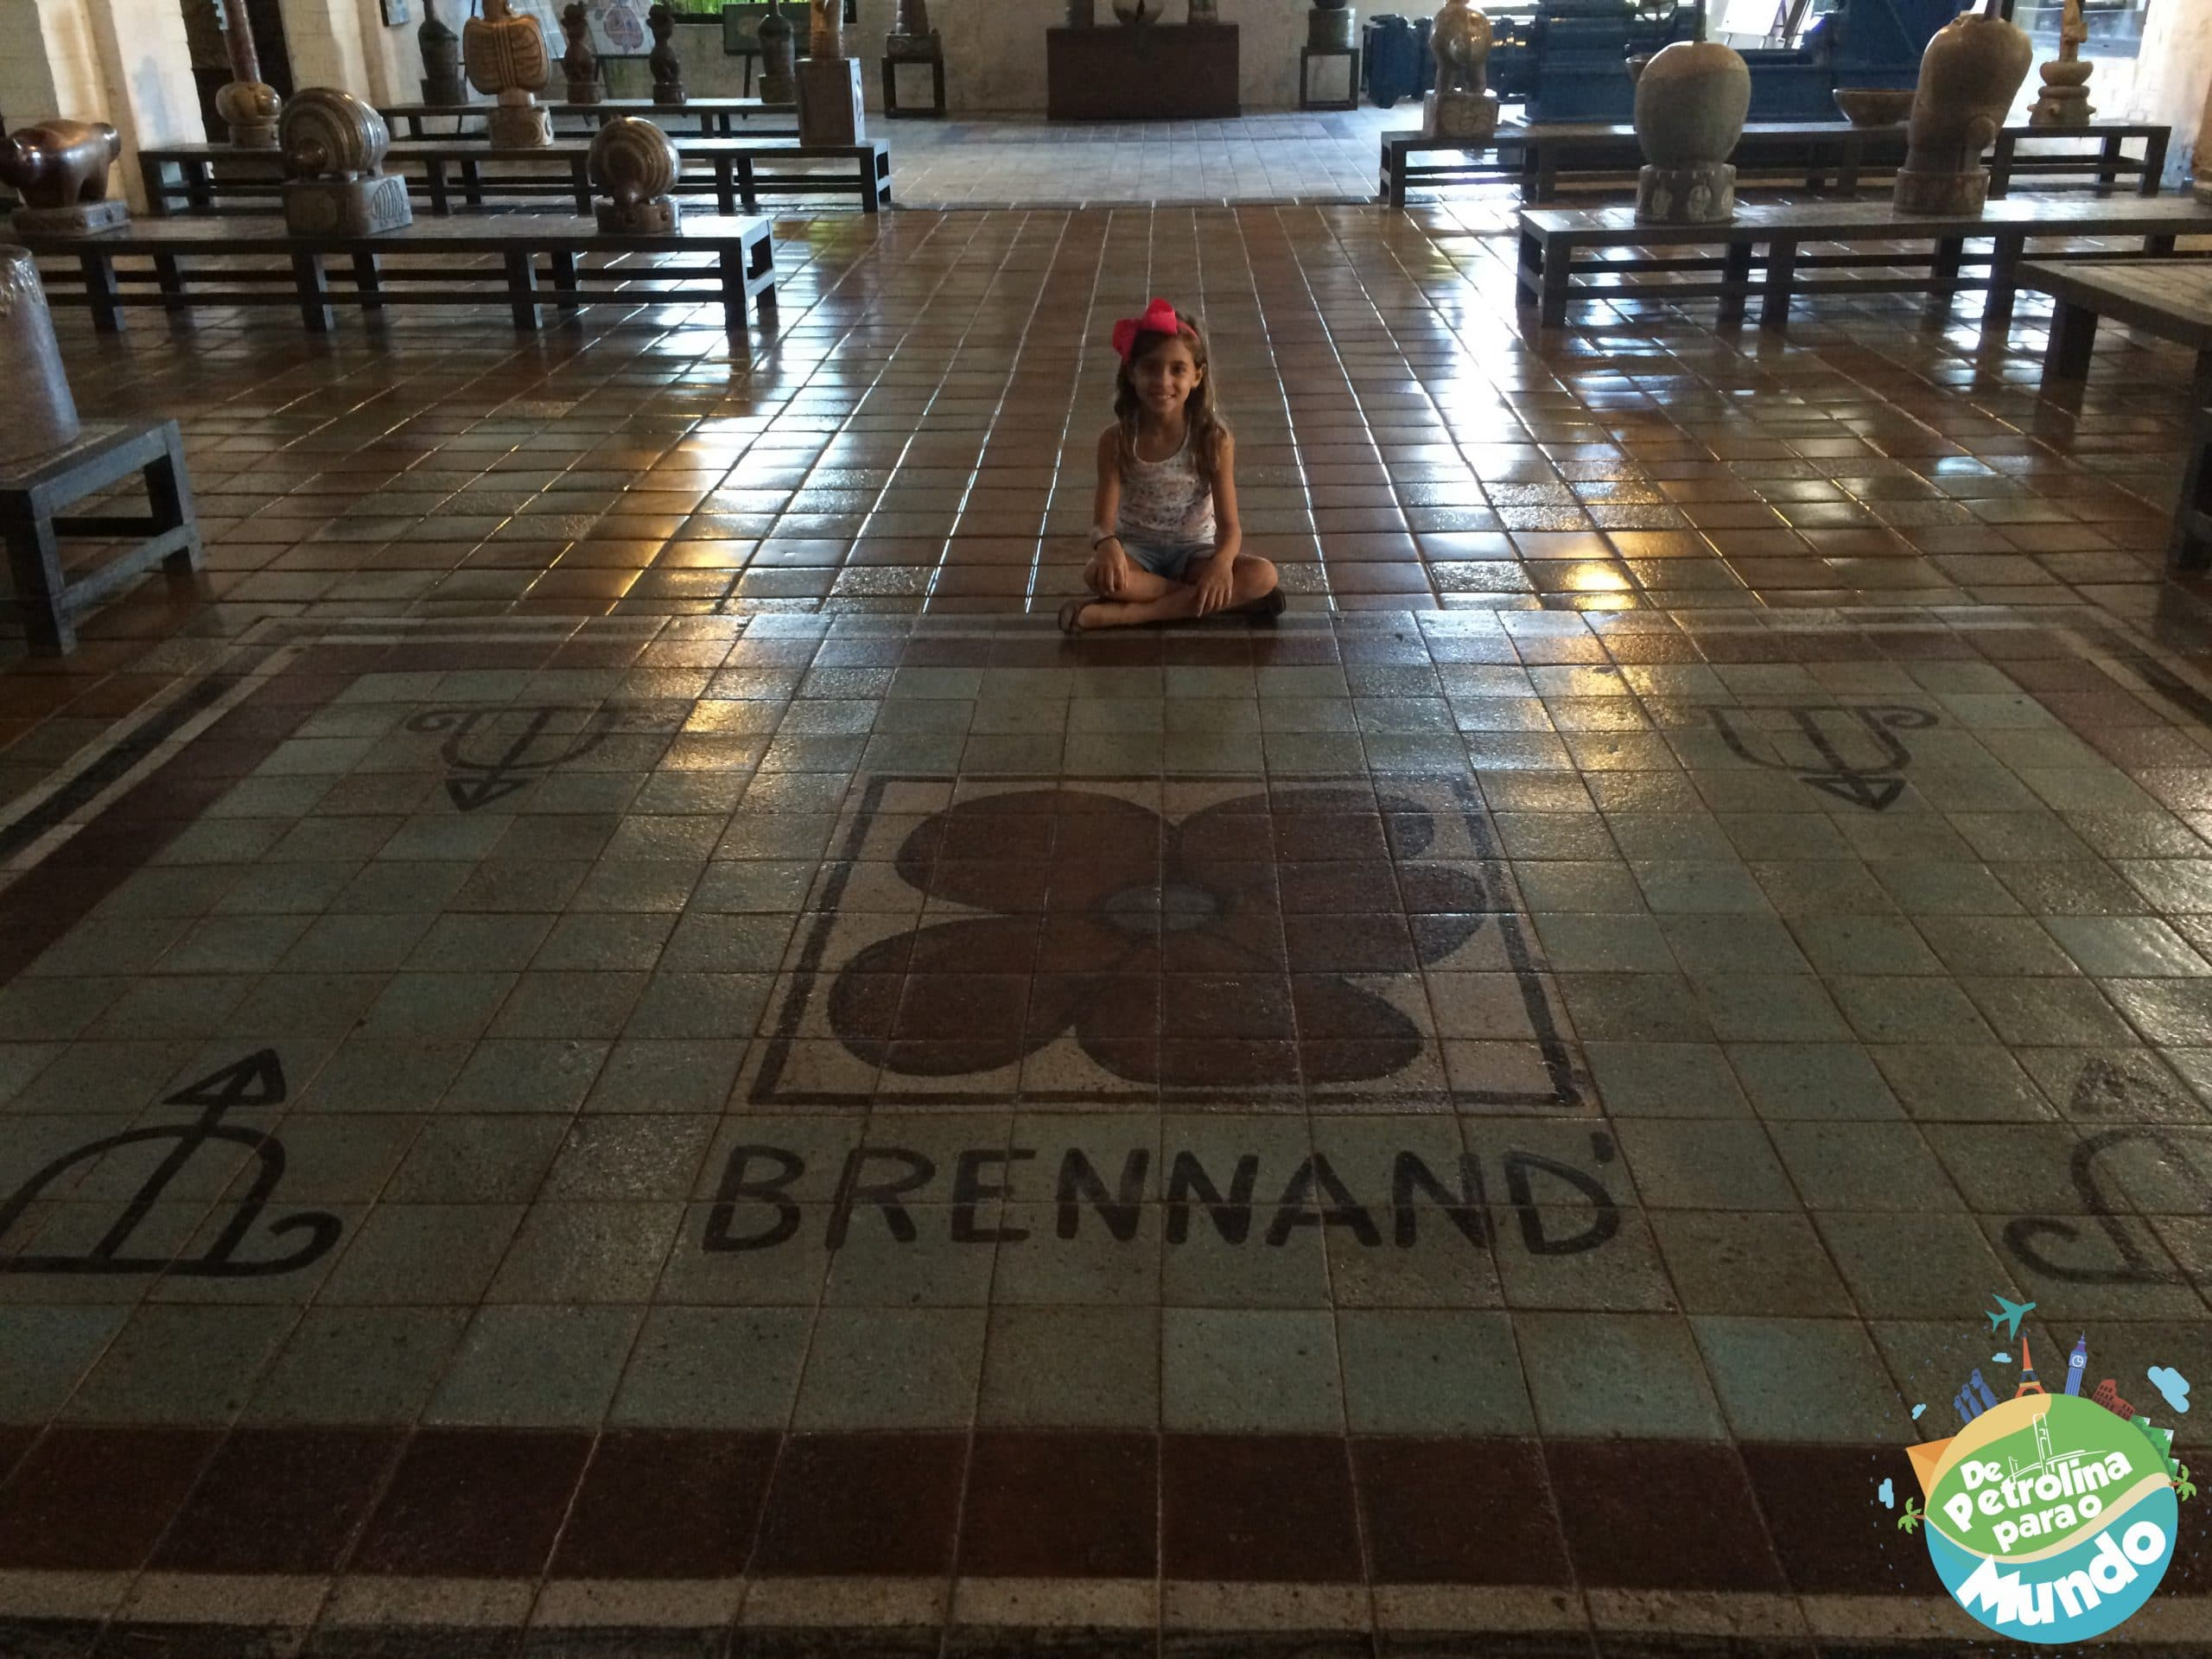 Oficina Brennand